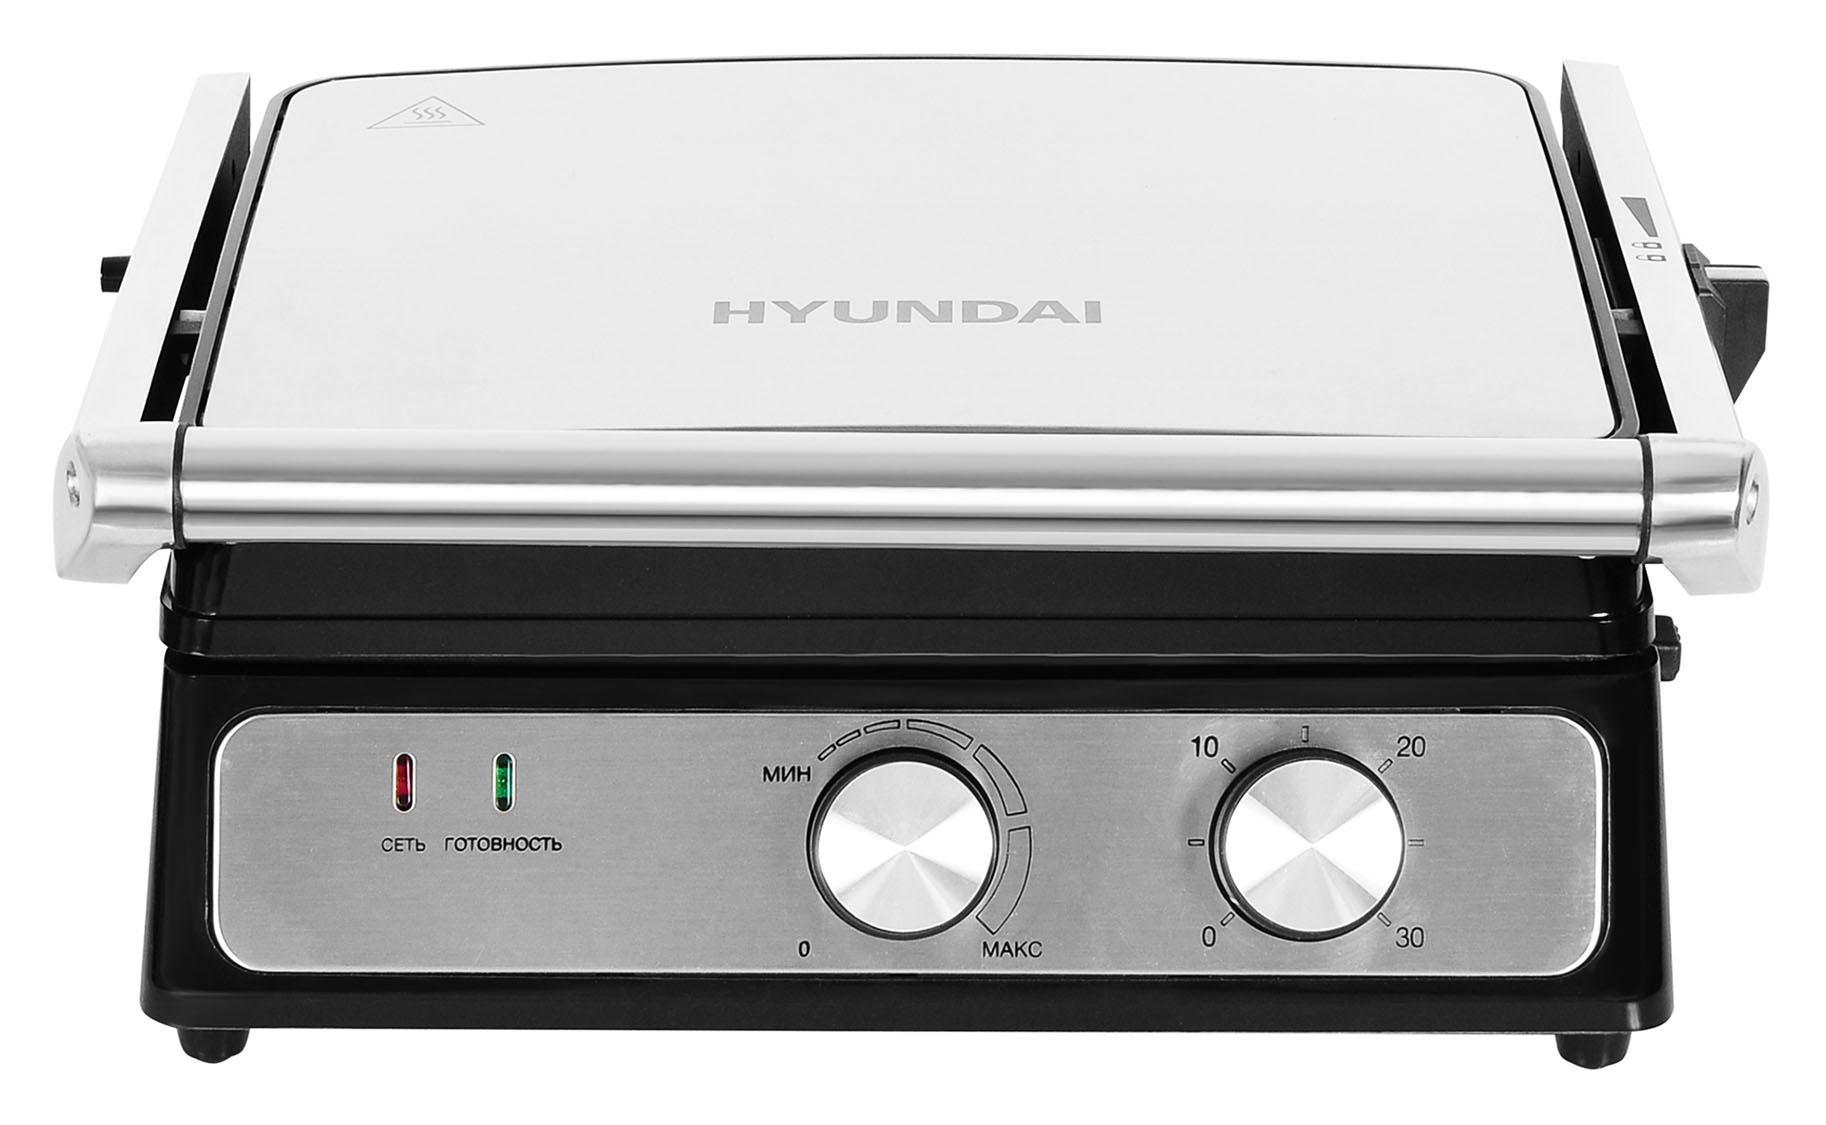 Электрогриль Hyundai HYG-2040 2000Вт серебристый